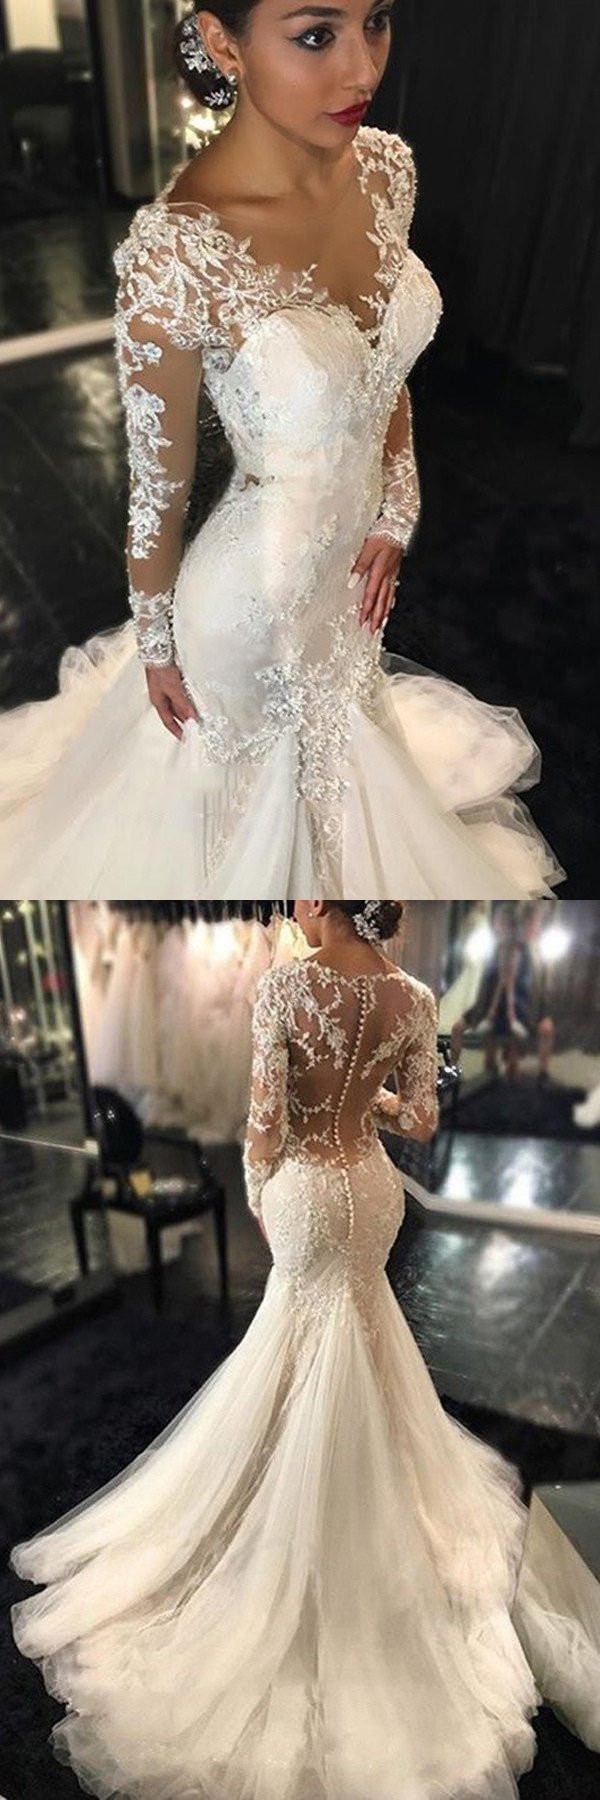 ?Long Sleeve Lace Mermaid Wedding Dresses, Sexy See Through Long Custom Wedding